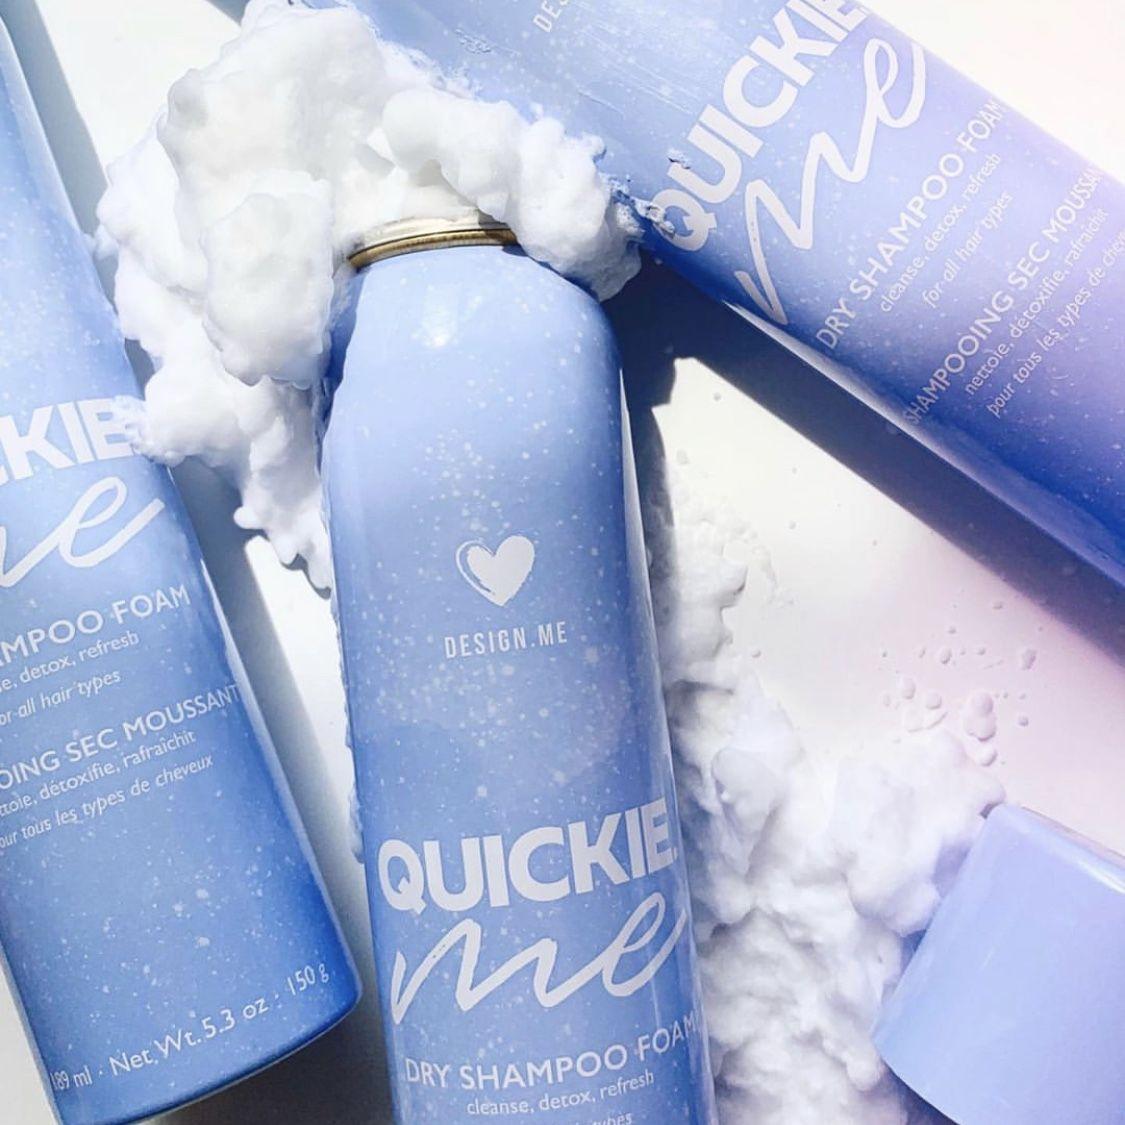 Design Me Quickie Me Dry Shampoo Foam Dry Shampoo Best Dry Shampoo Paraben Free Products